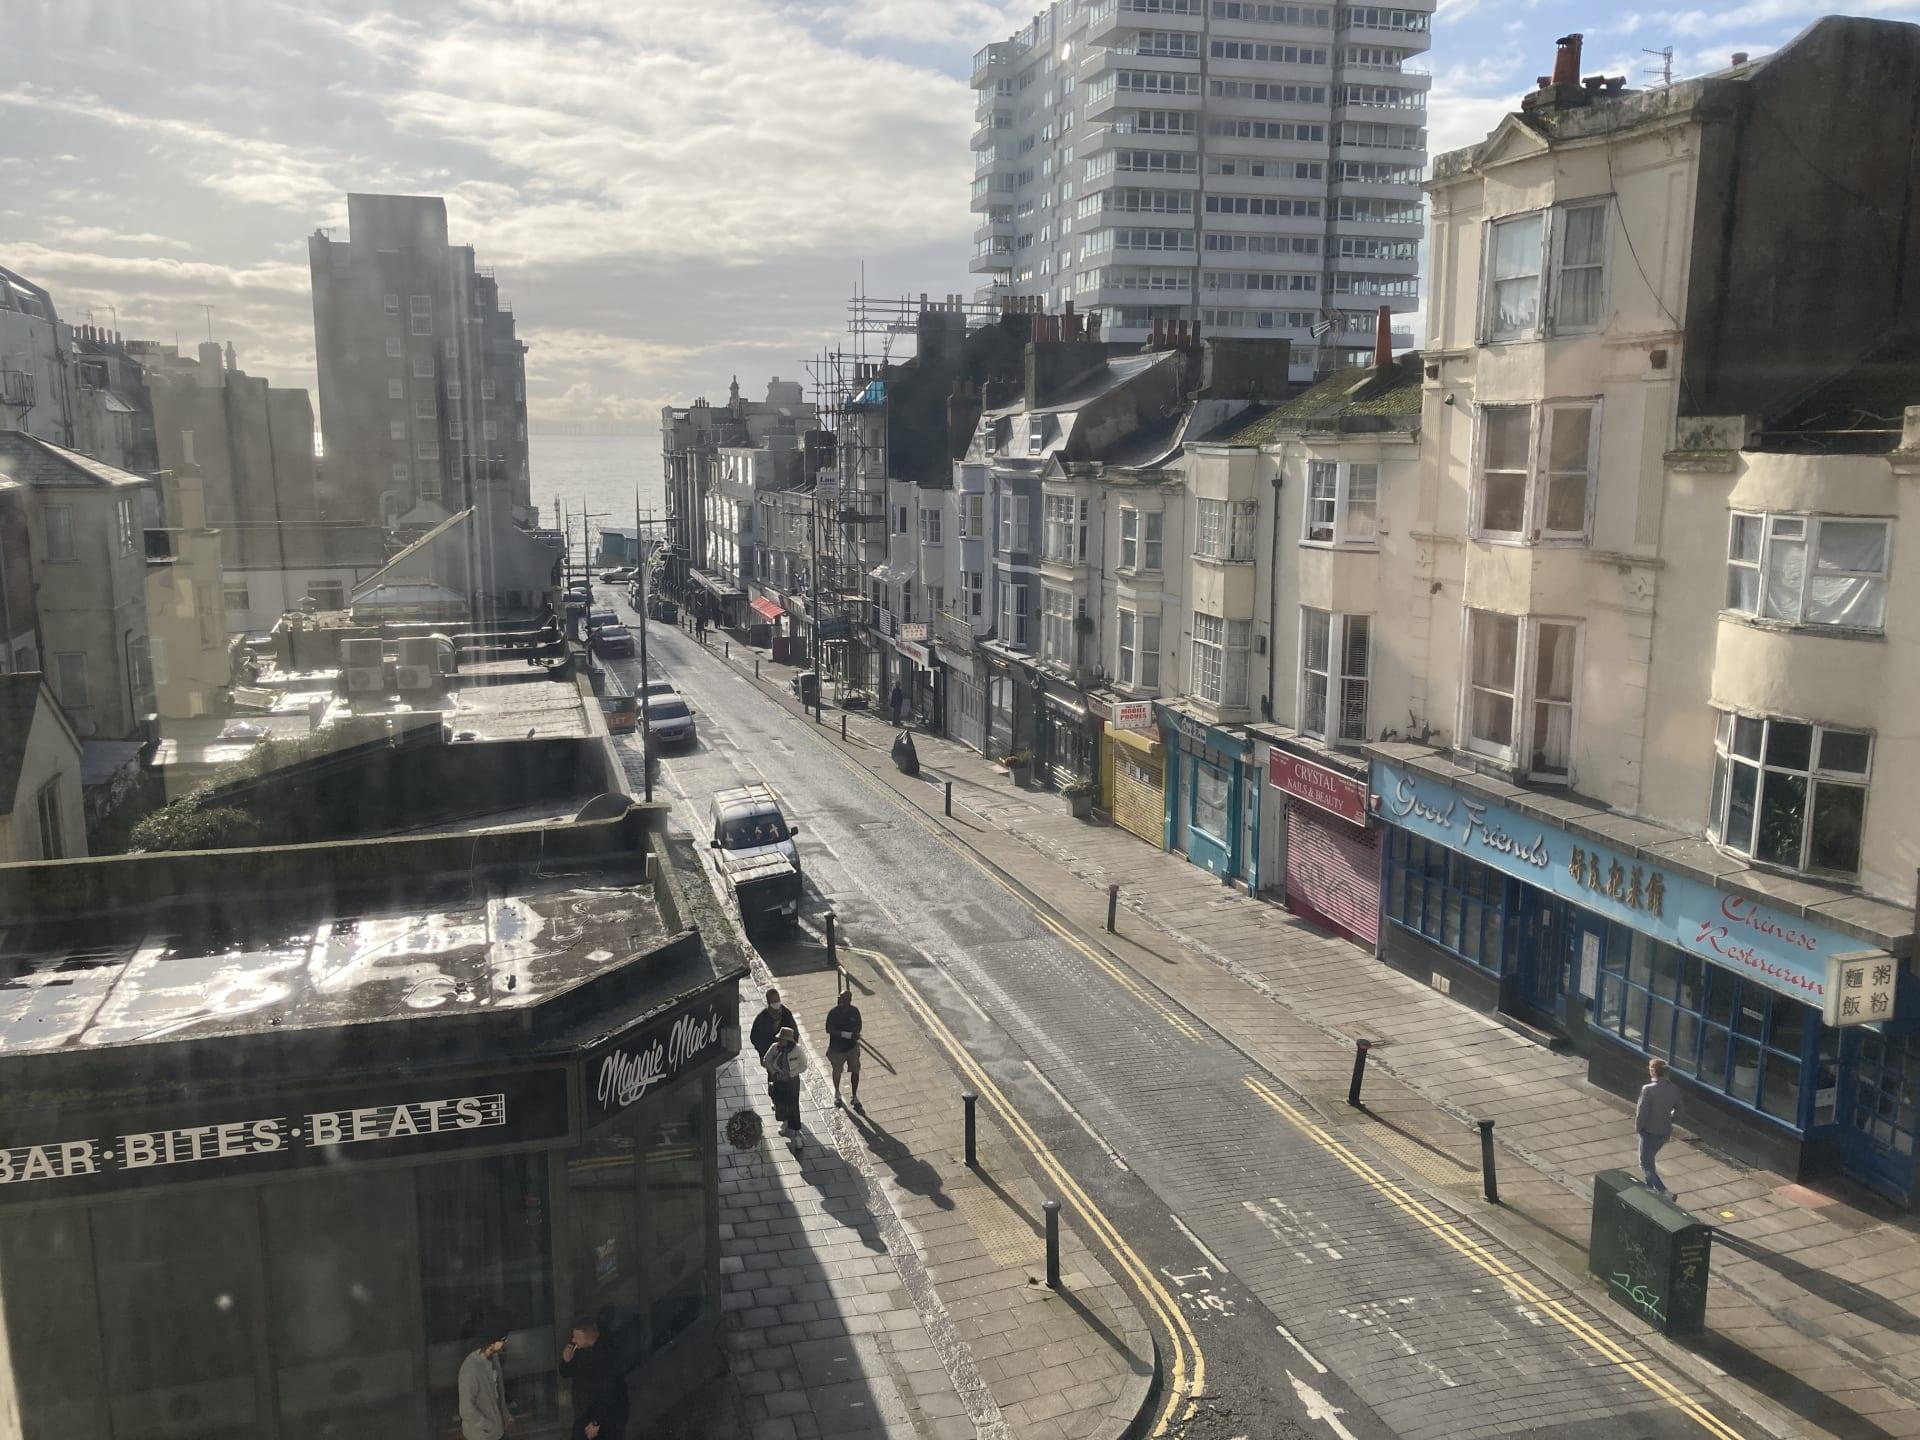 Regency Square Brighton image.